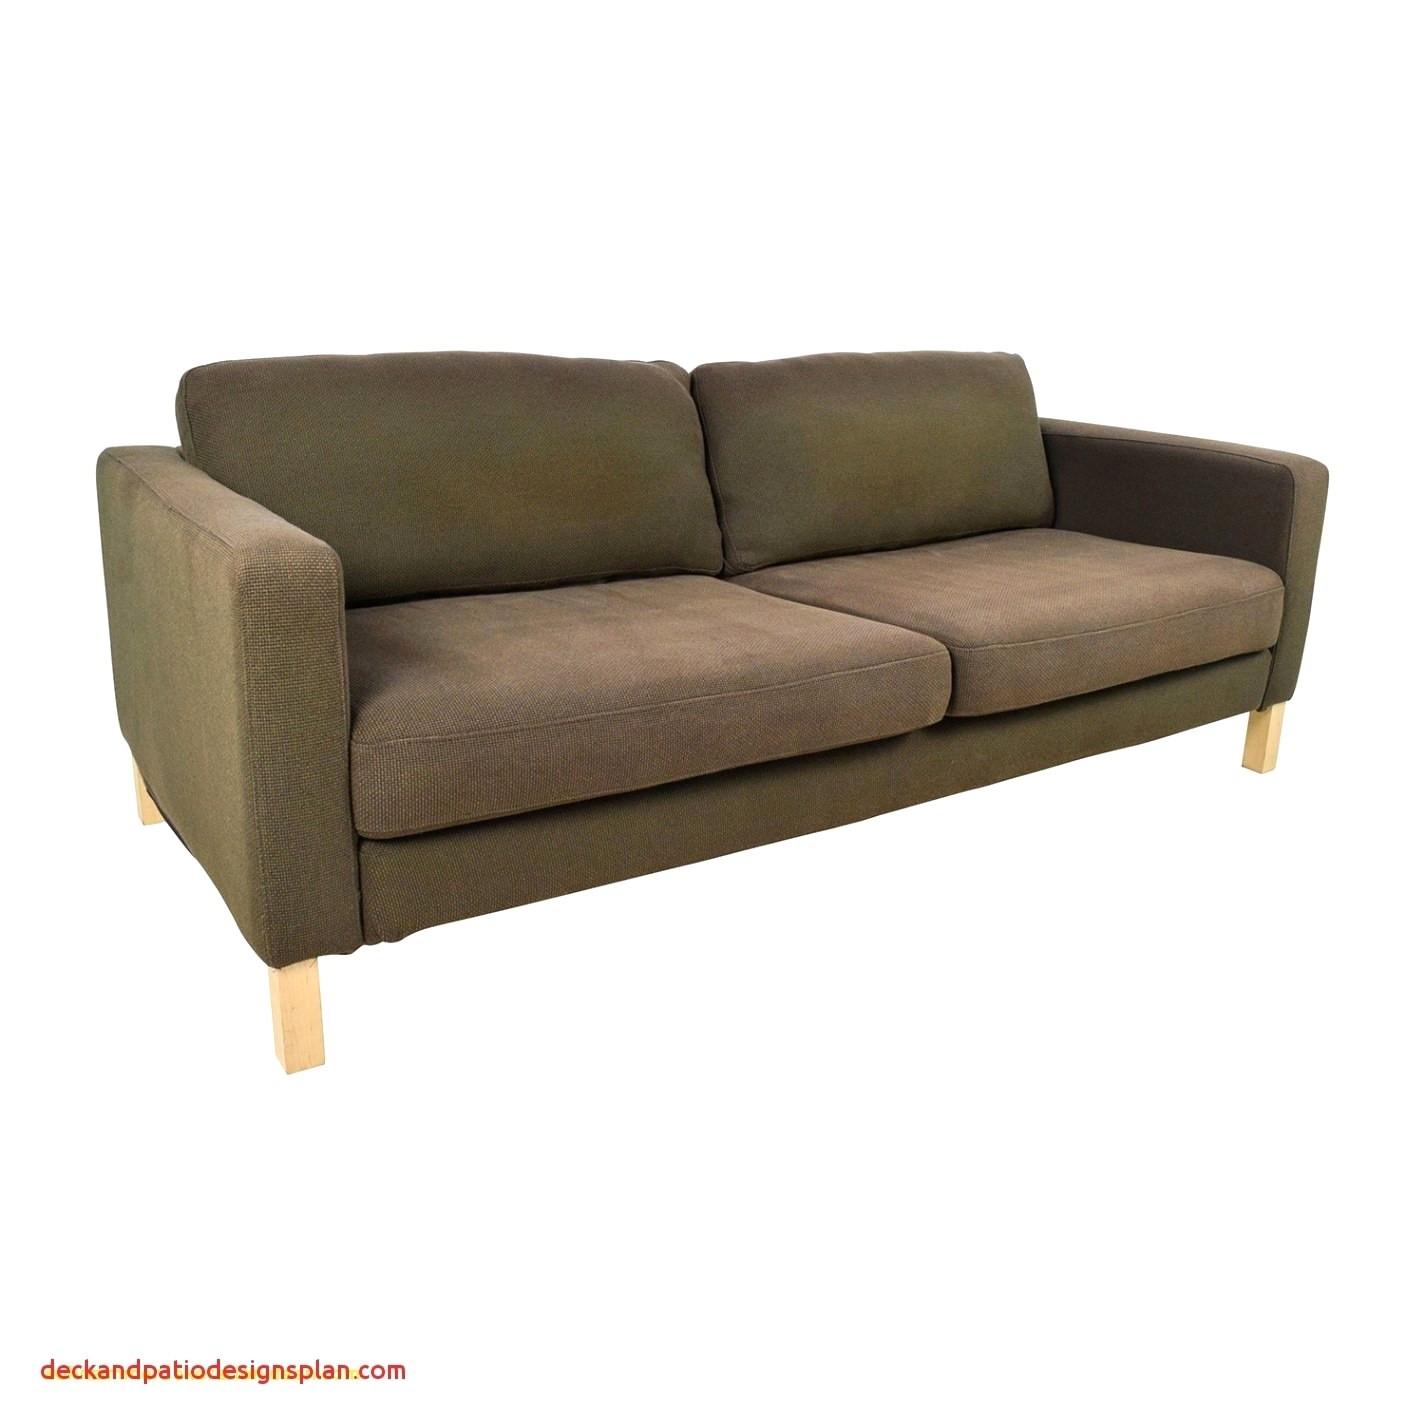 Svanby Grau Ikea